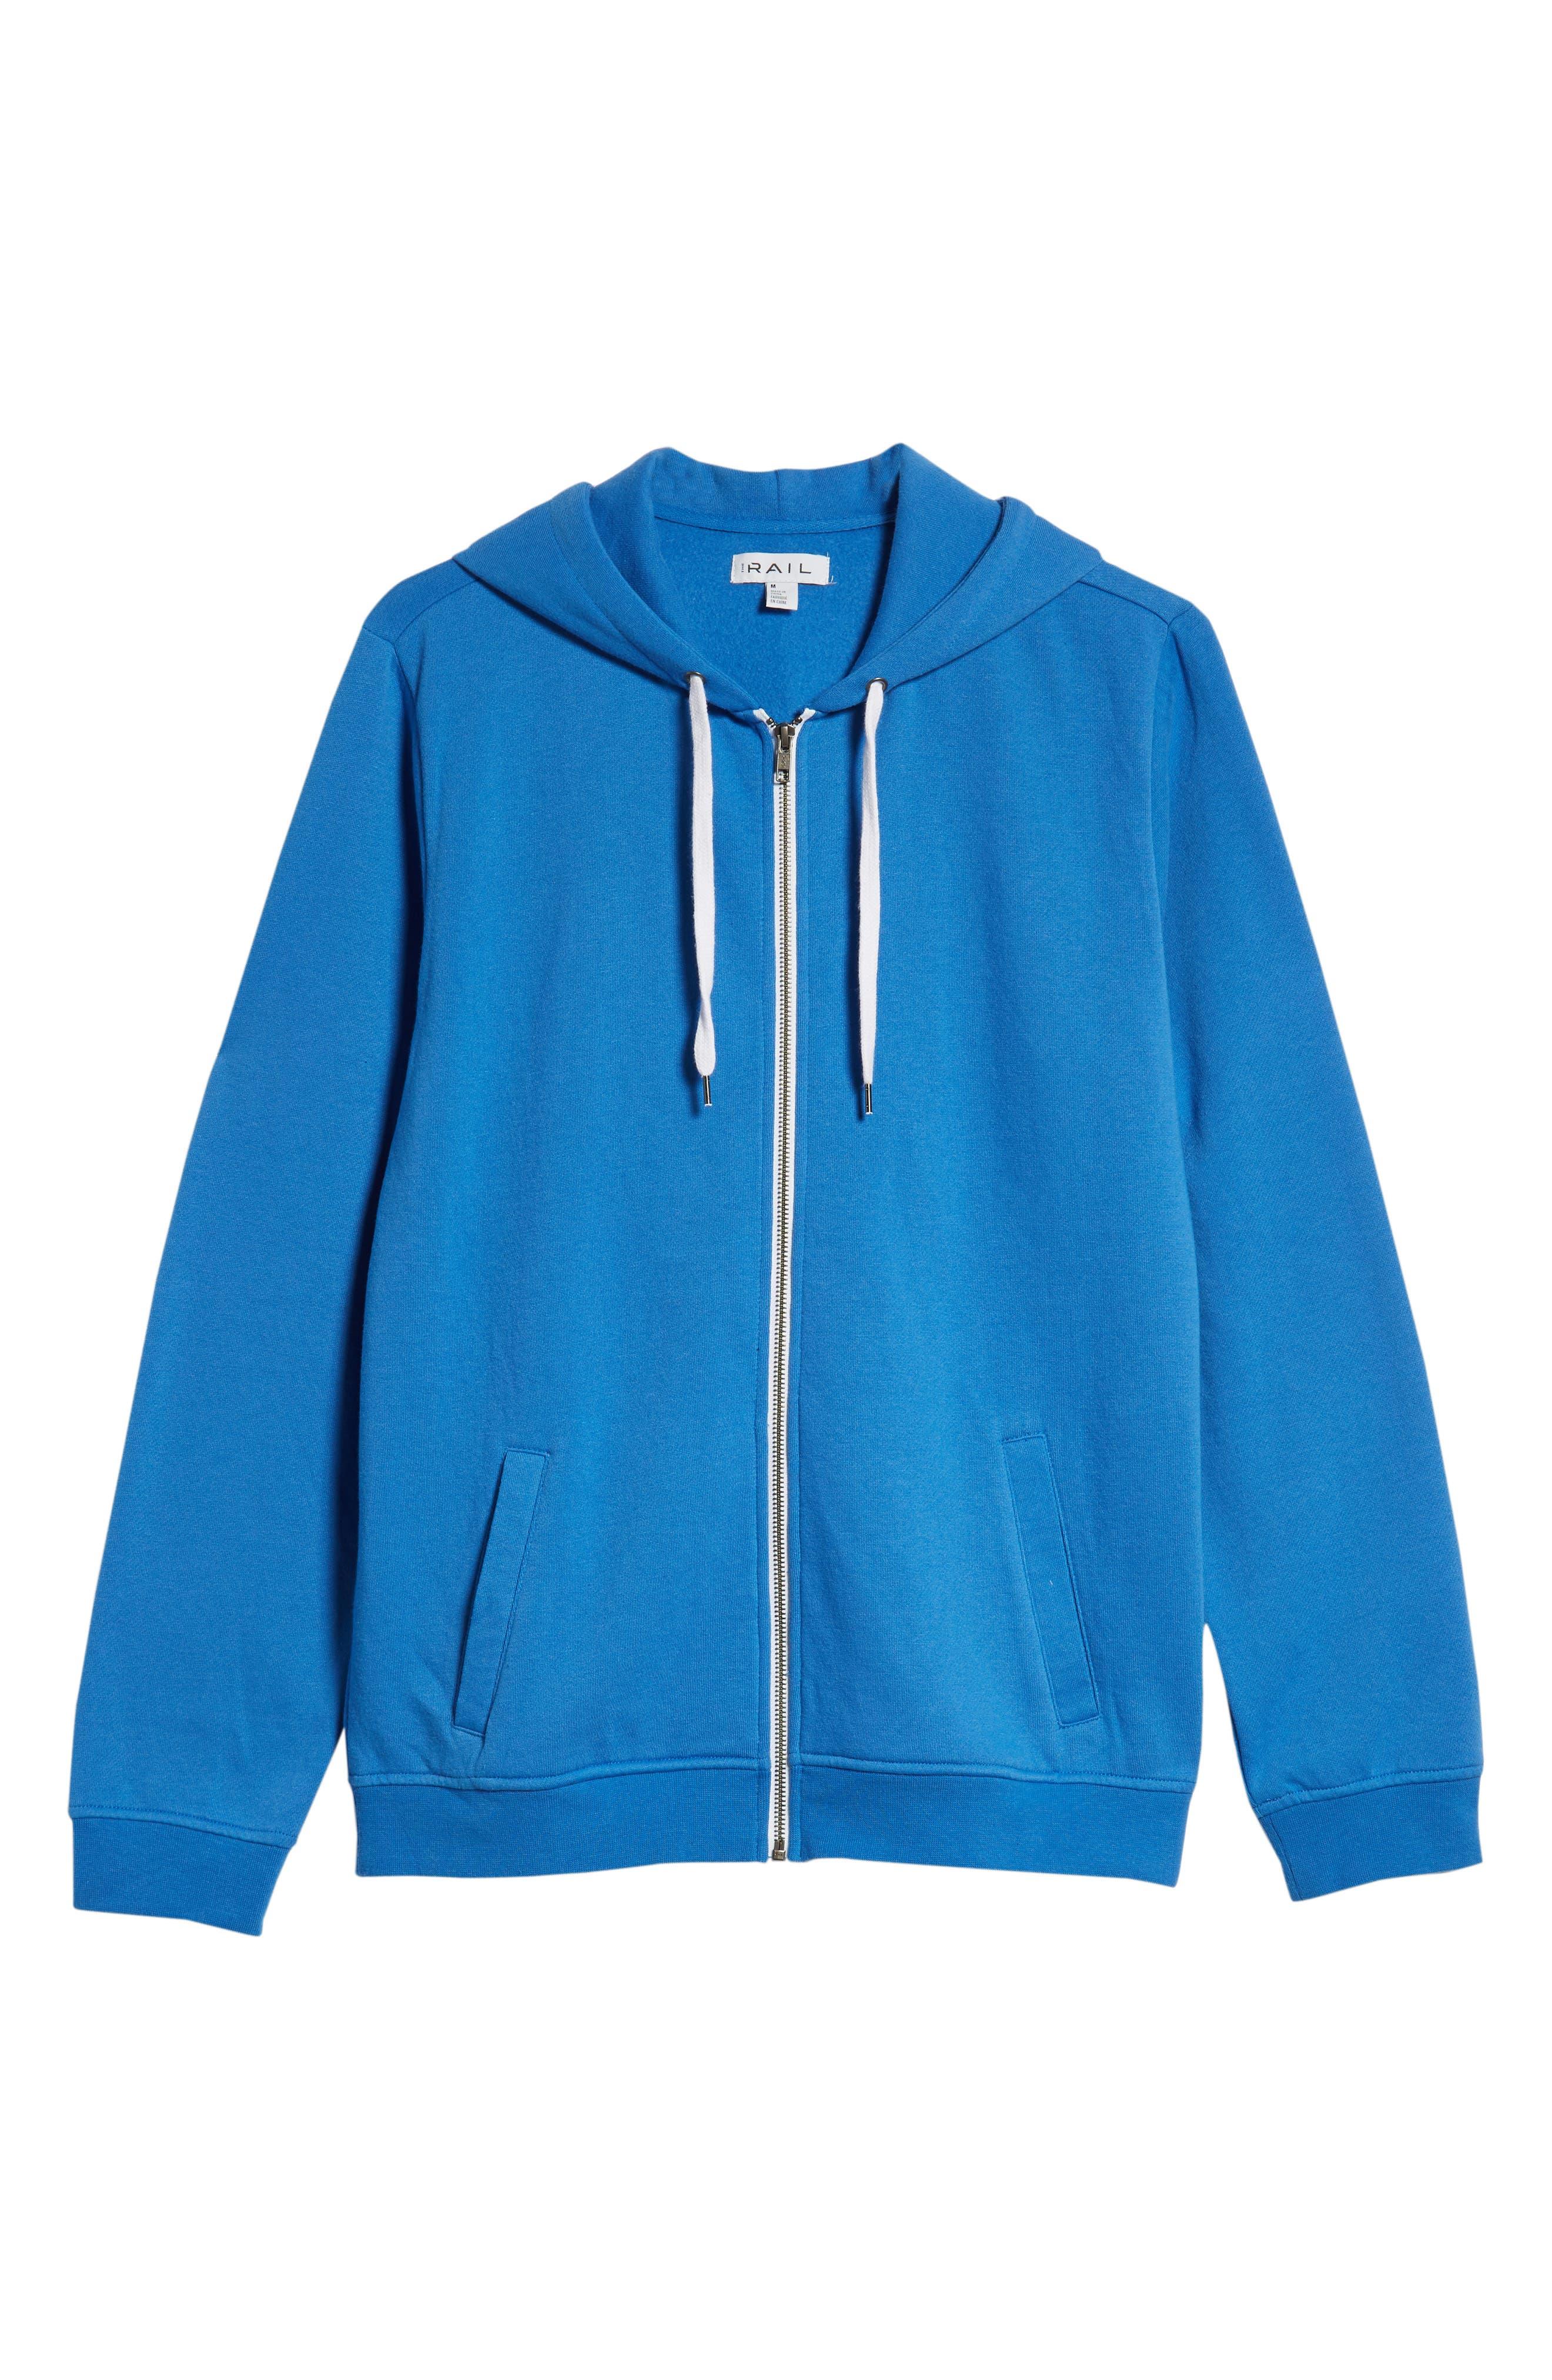 Full Zip Hoodie,                             Alternate thumbnail 6, color,                             BLUE BLISS